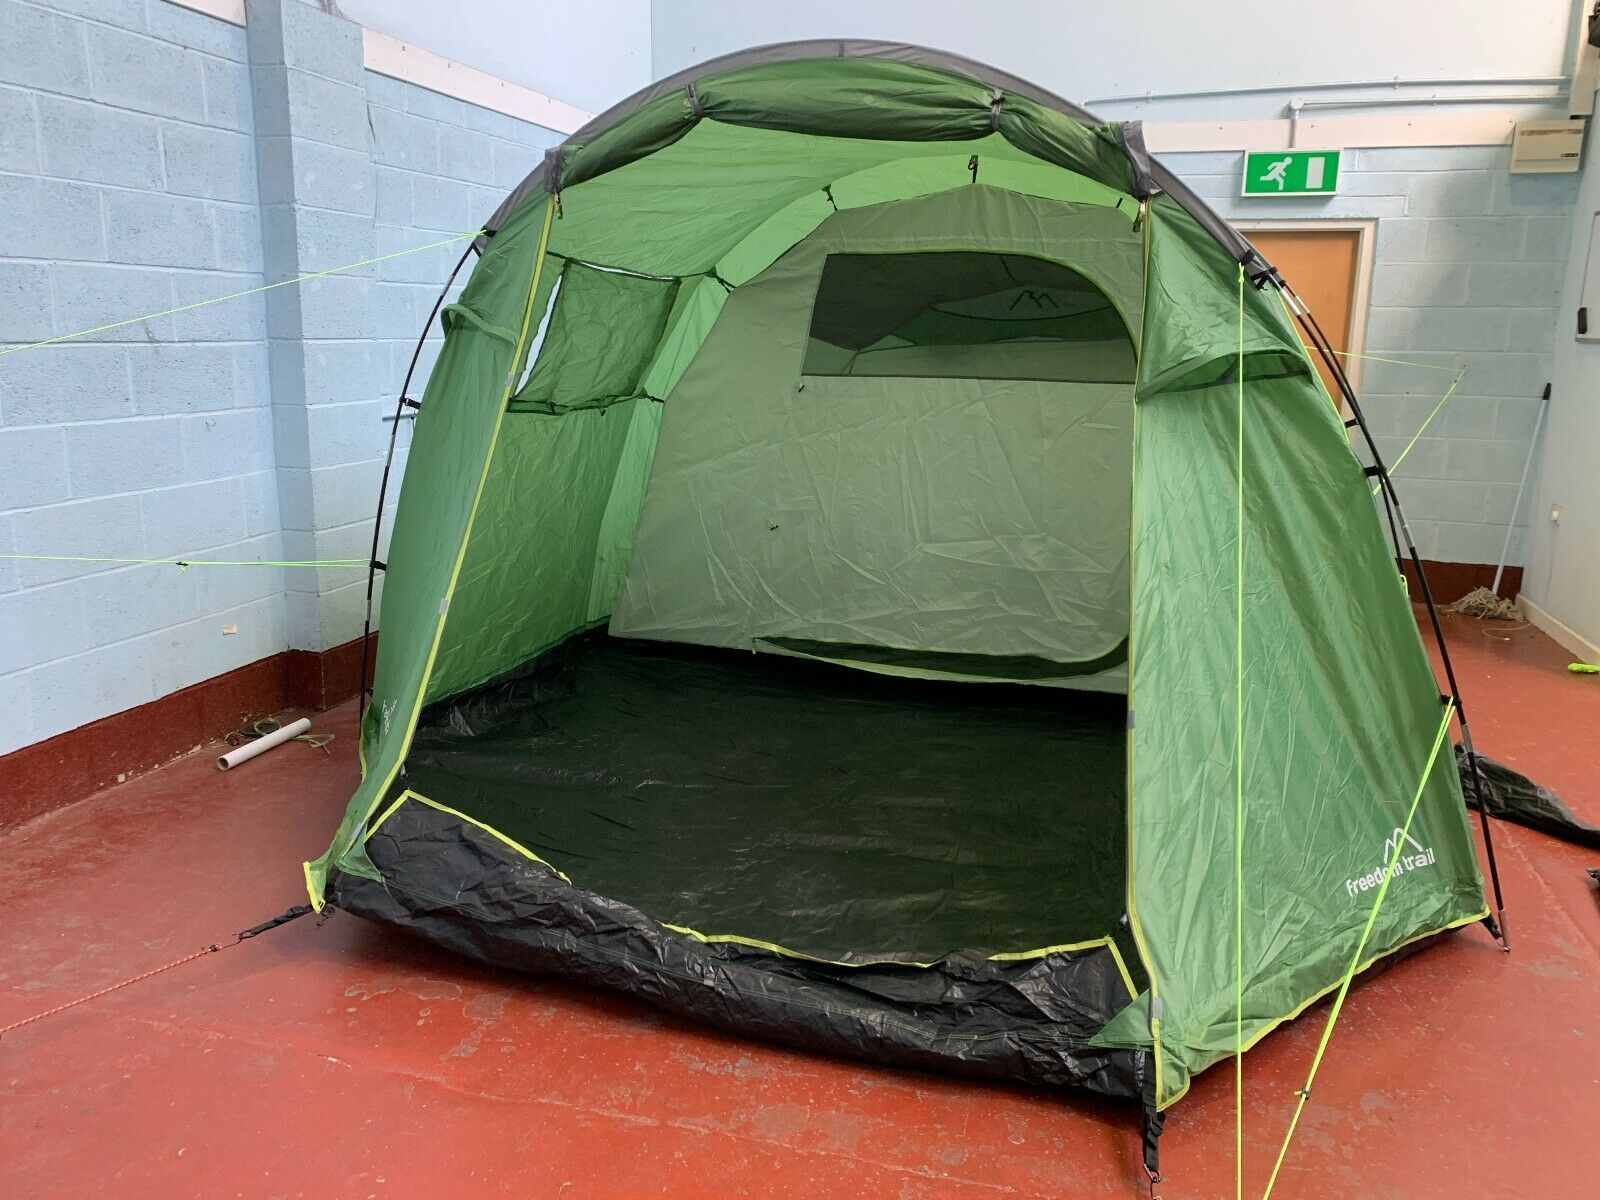 Six berth man person family camping tunnel tent large green Eurohike Sendero 6